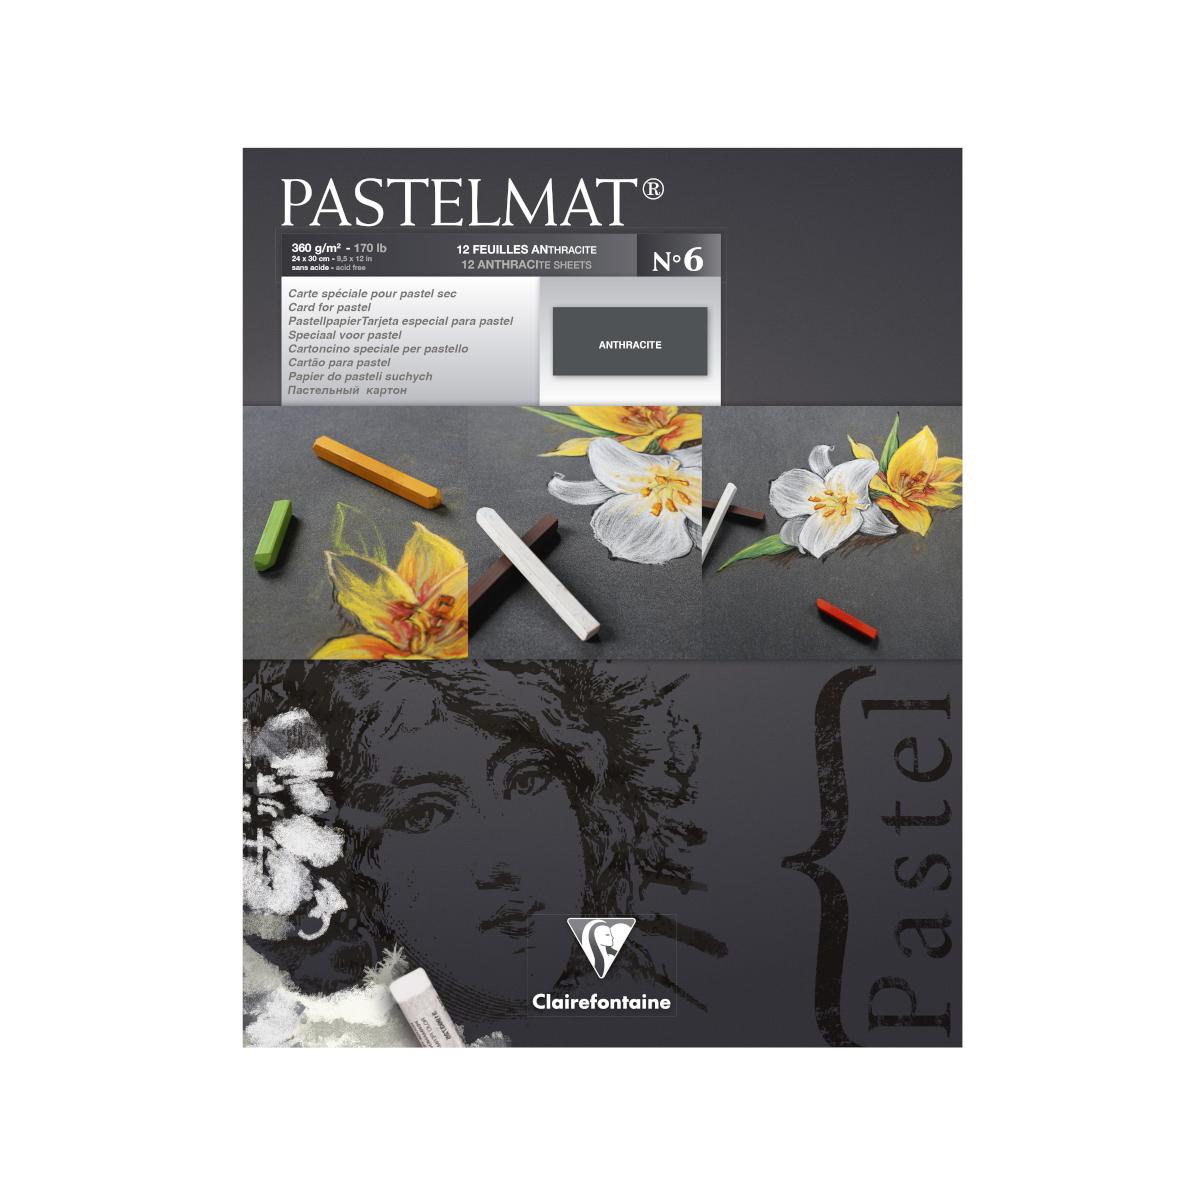 Clairefontaine,Pastelmat pastelpapir, blok, 360g, 12 ark, antracit